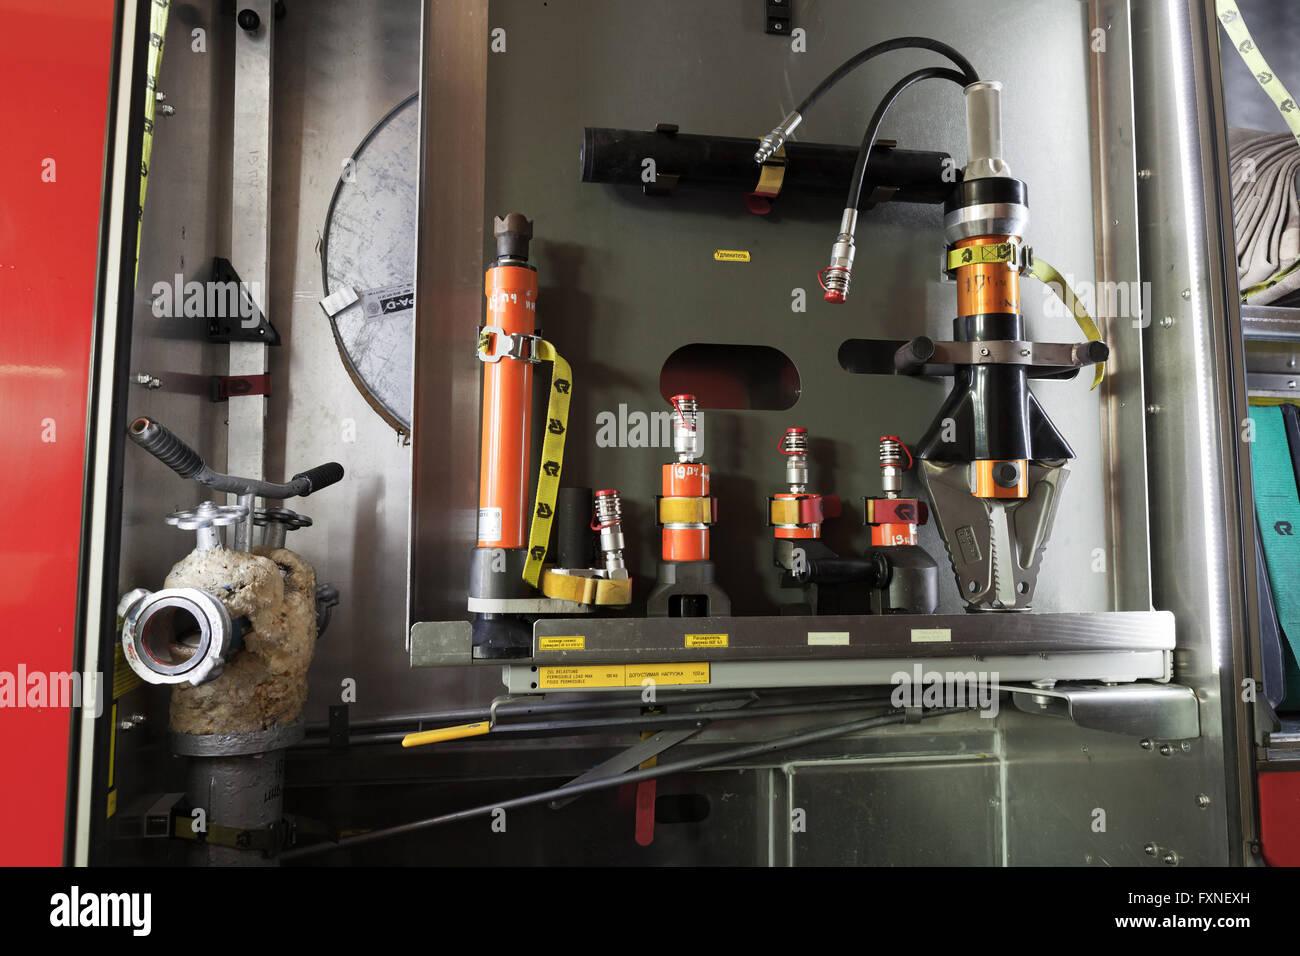 Saint-Petersburg, Russia - April 9, 2016: Firefighting equipment of modern Russian fire truck. Water hydrants - Stock Image